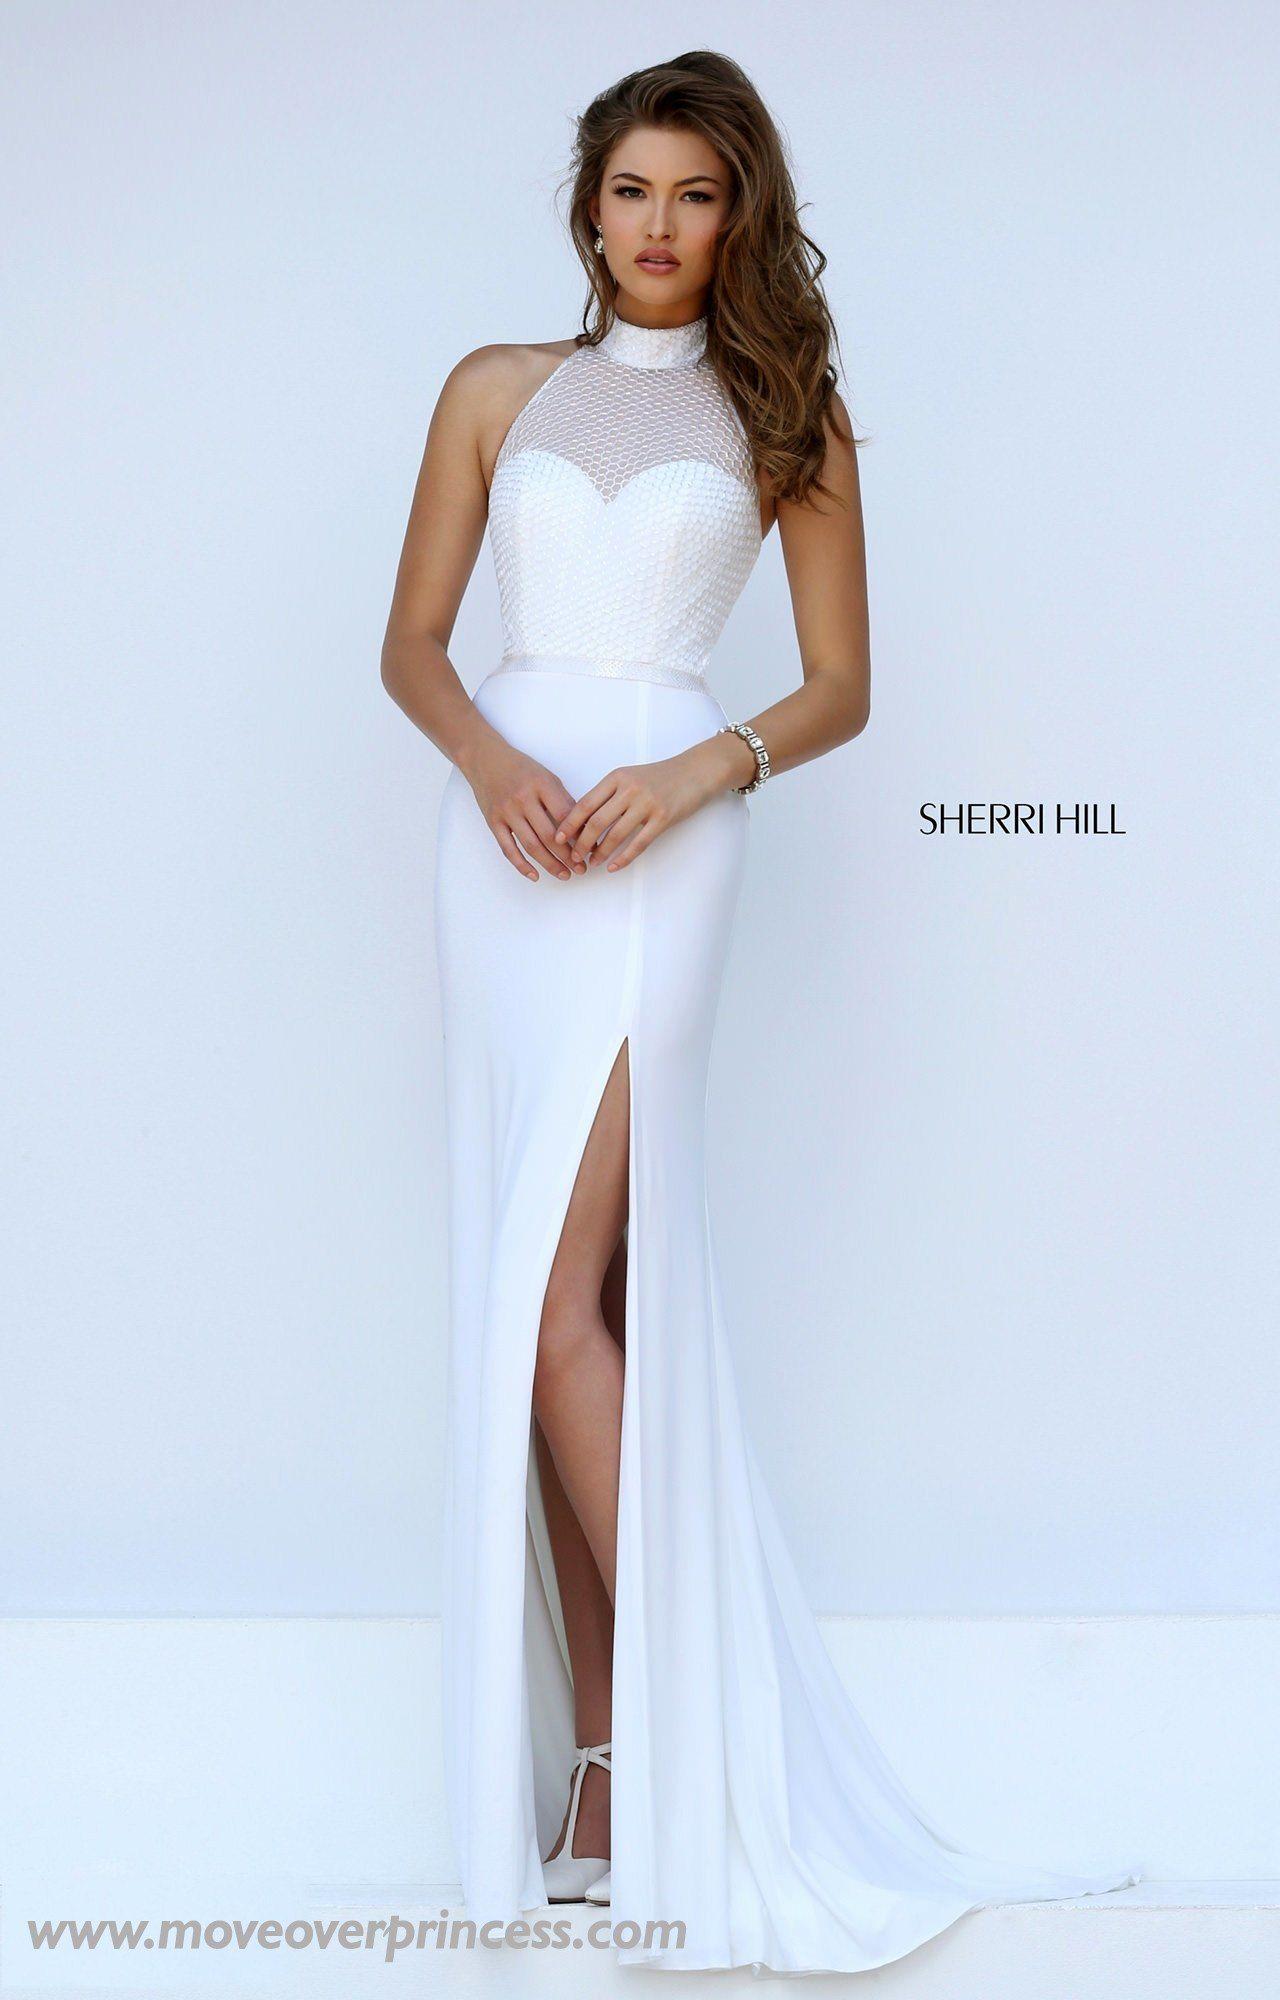 Sherri hill red size school prom and sherri hill gowns